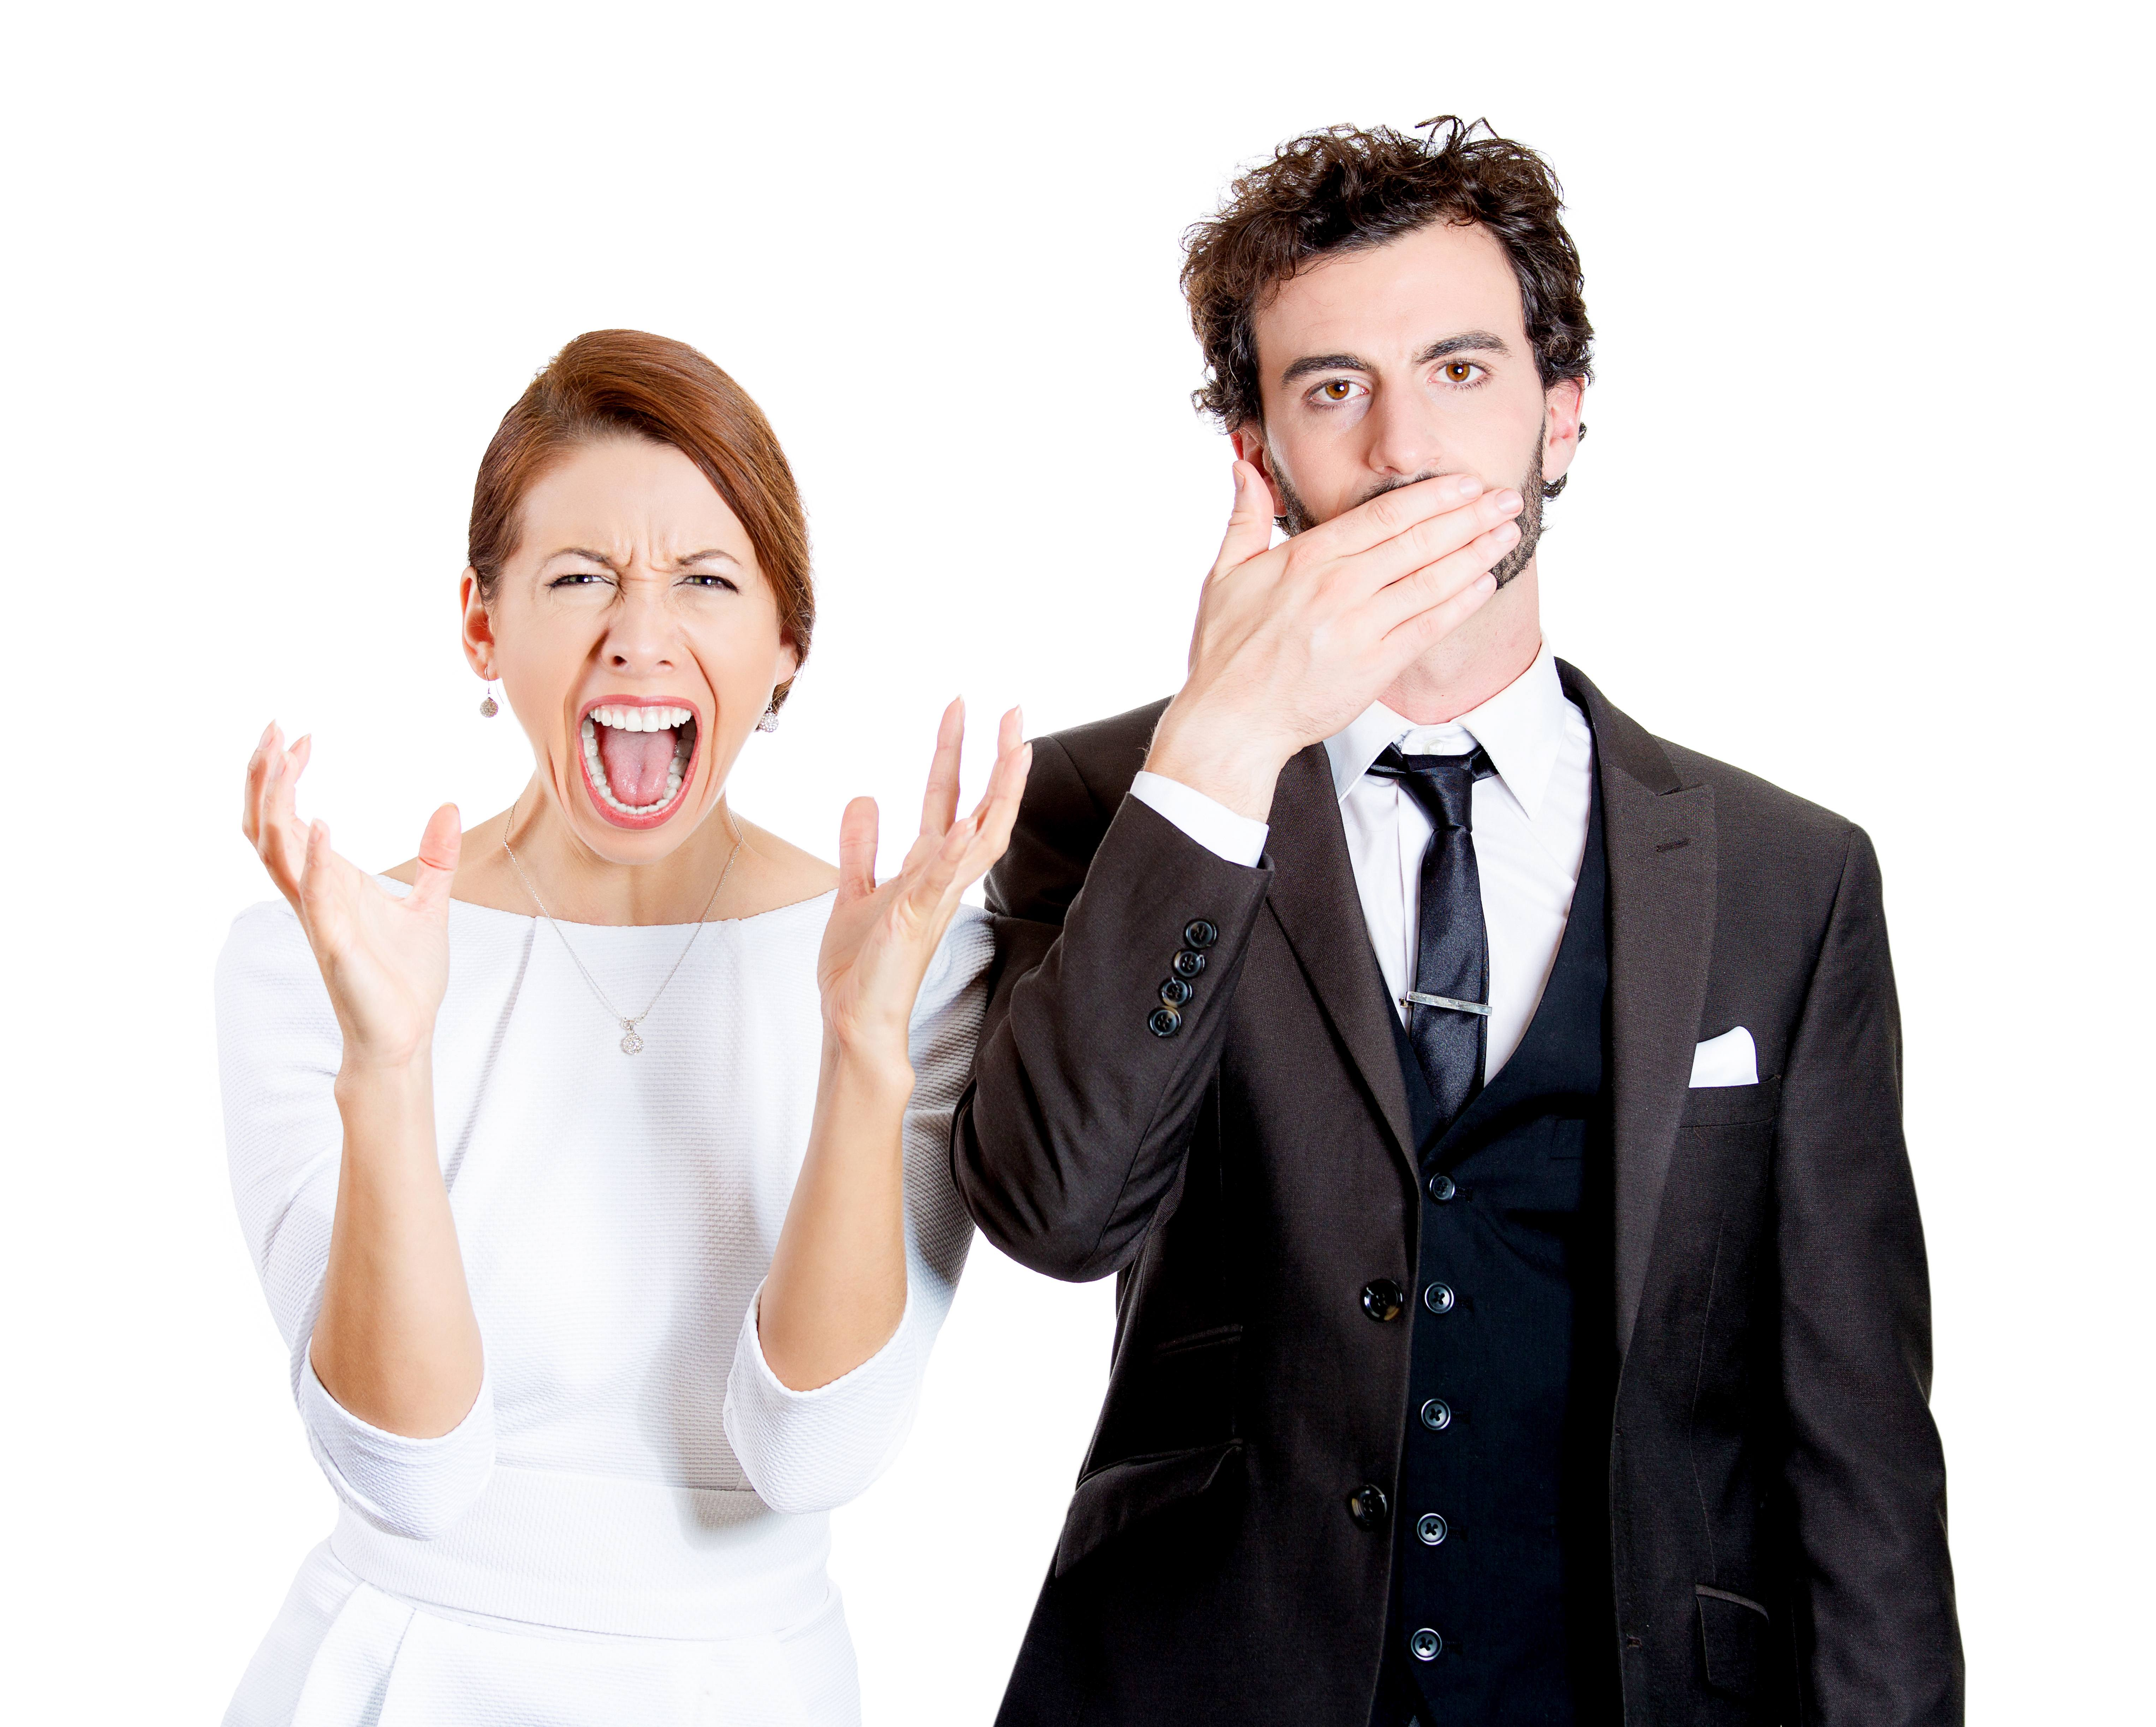 3 IDEAS TO NAVIGATE DIFFICULT CONVERSATIONS